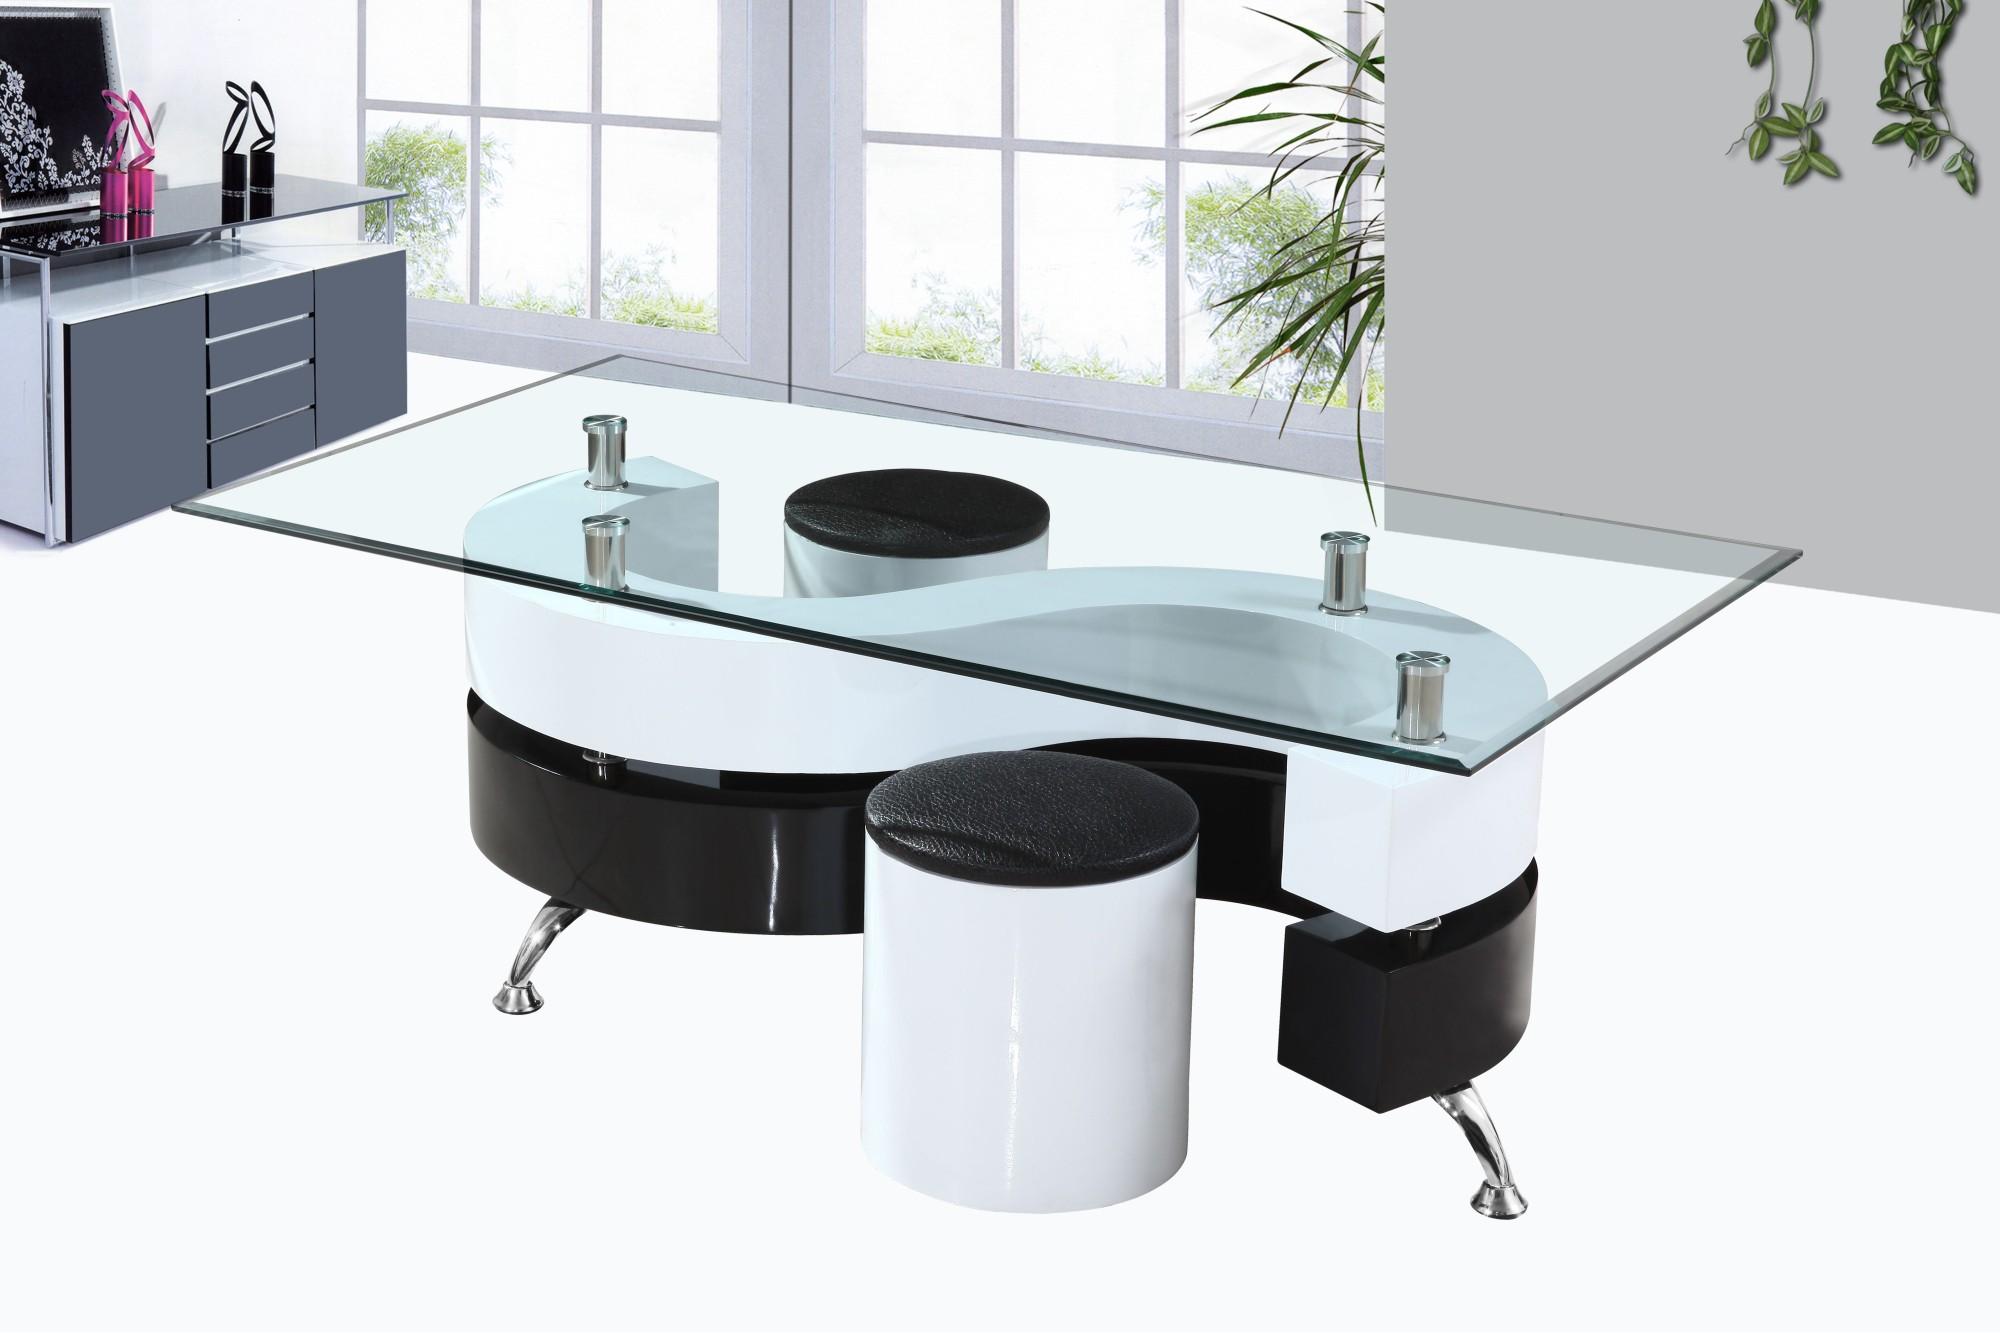 Table basse moderne avec pouf